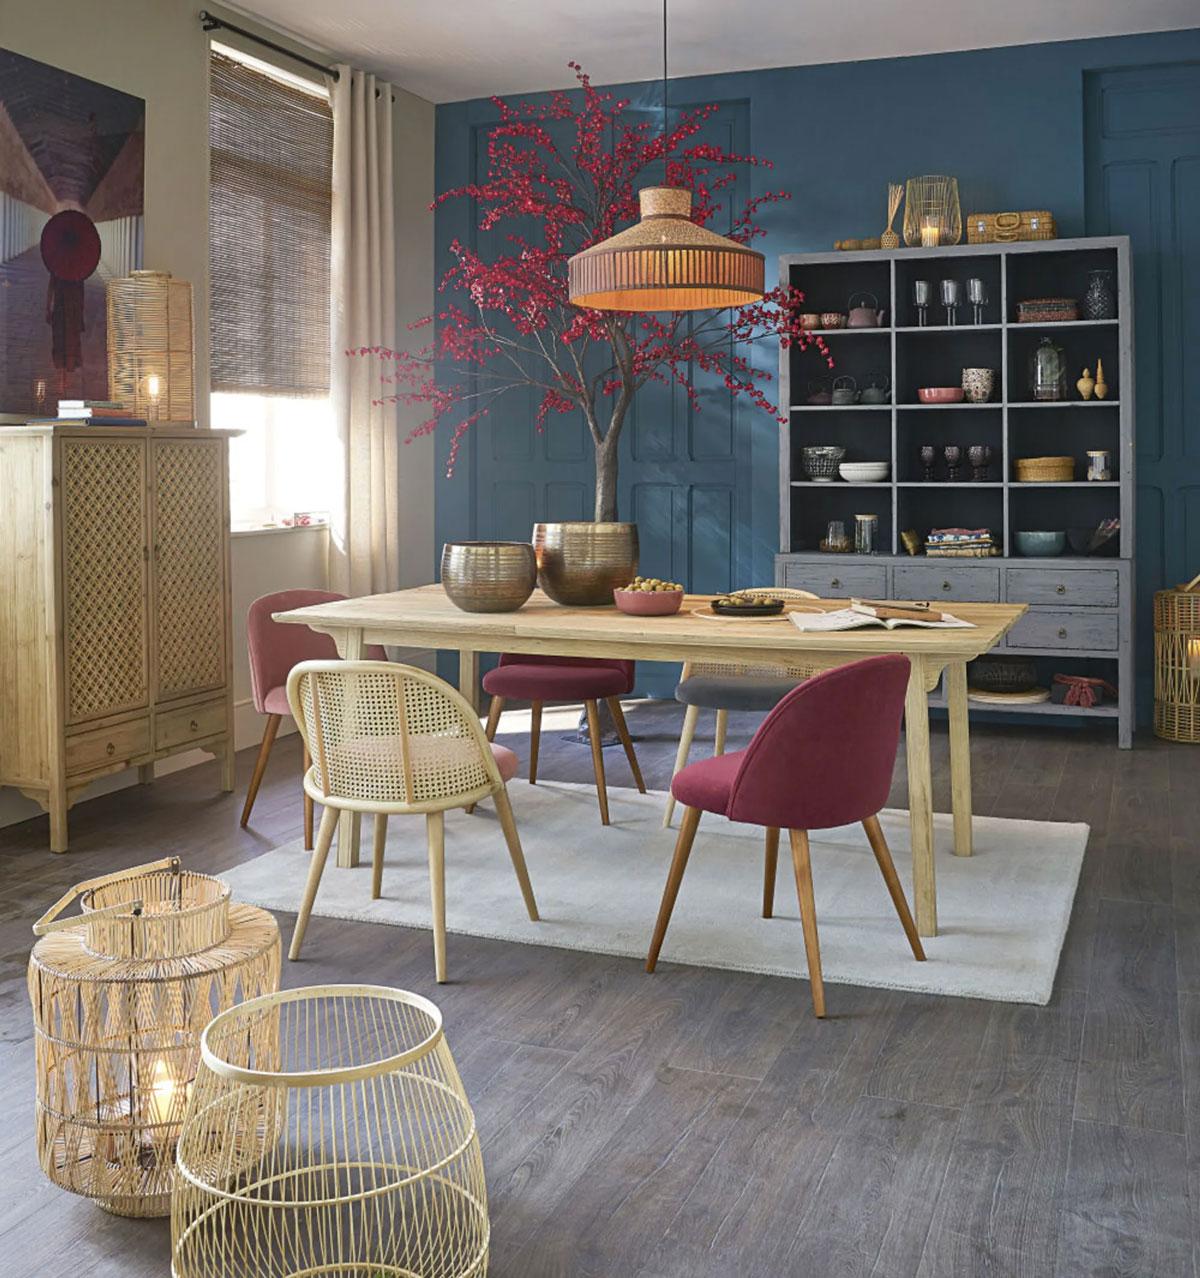 Maisons du monde sala da pranzo stile esotico